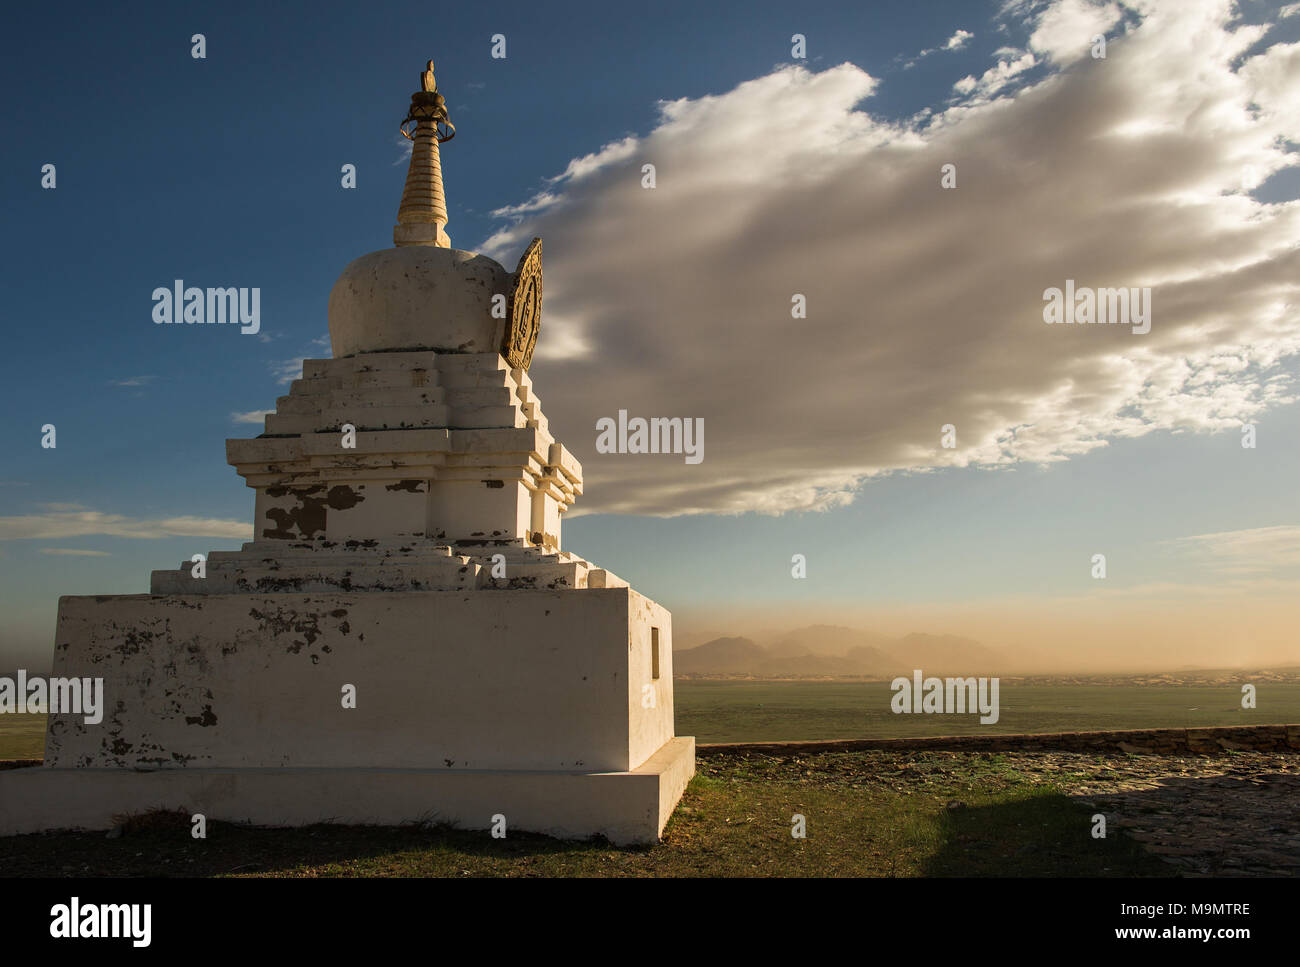 Buddhist shrine, sandstorm and dramatic cloud in the back, Gobi desert, Mongolia - Stock Image